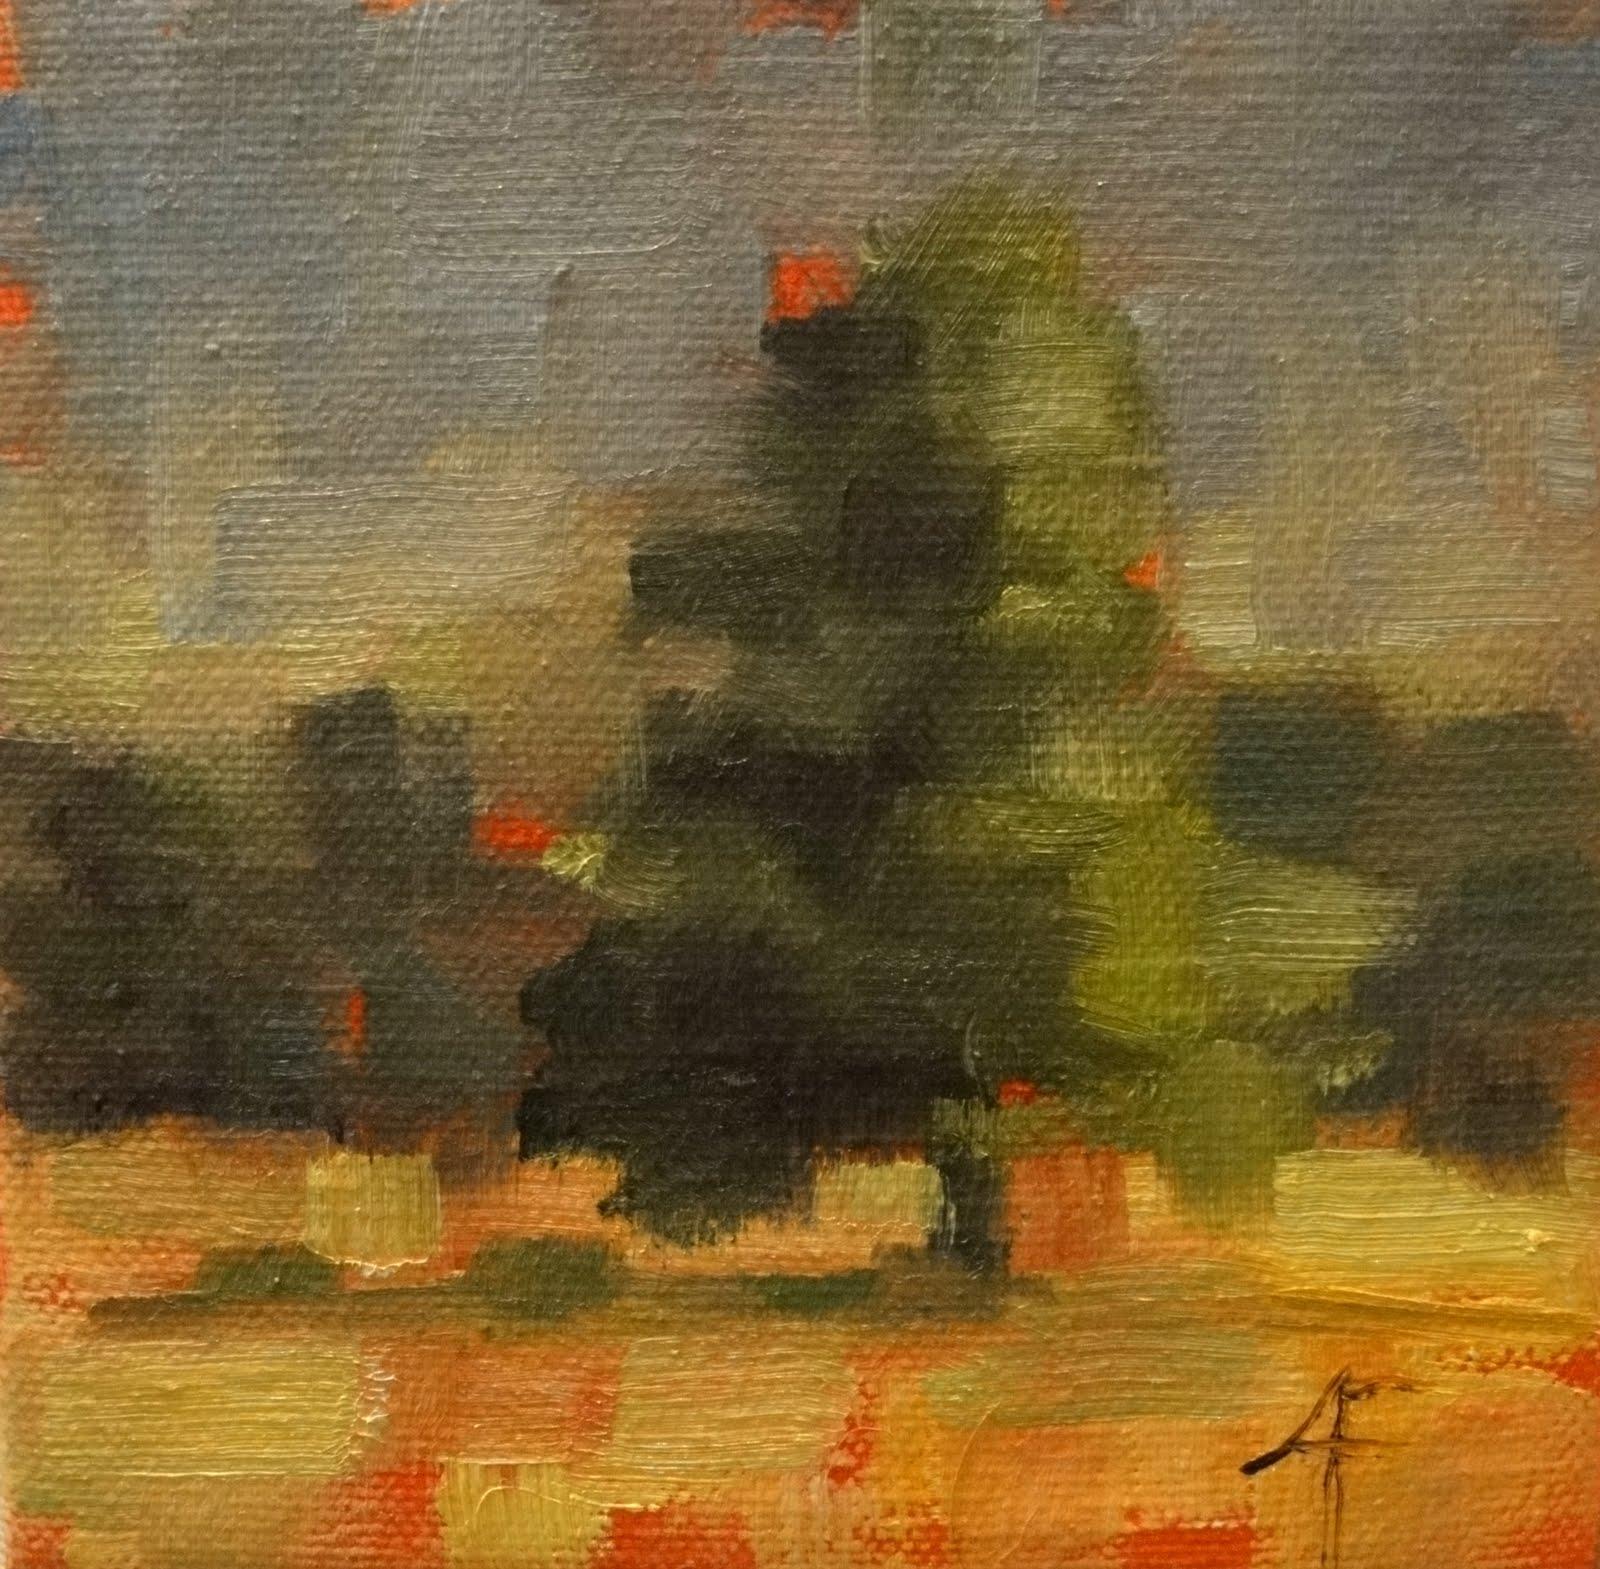 """Tree Study, Crabtree Forest 5x5"" original fine art by Ann Feldman"